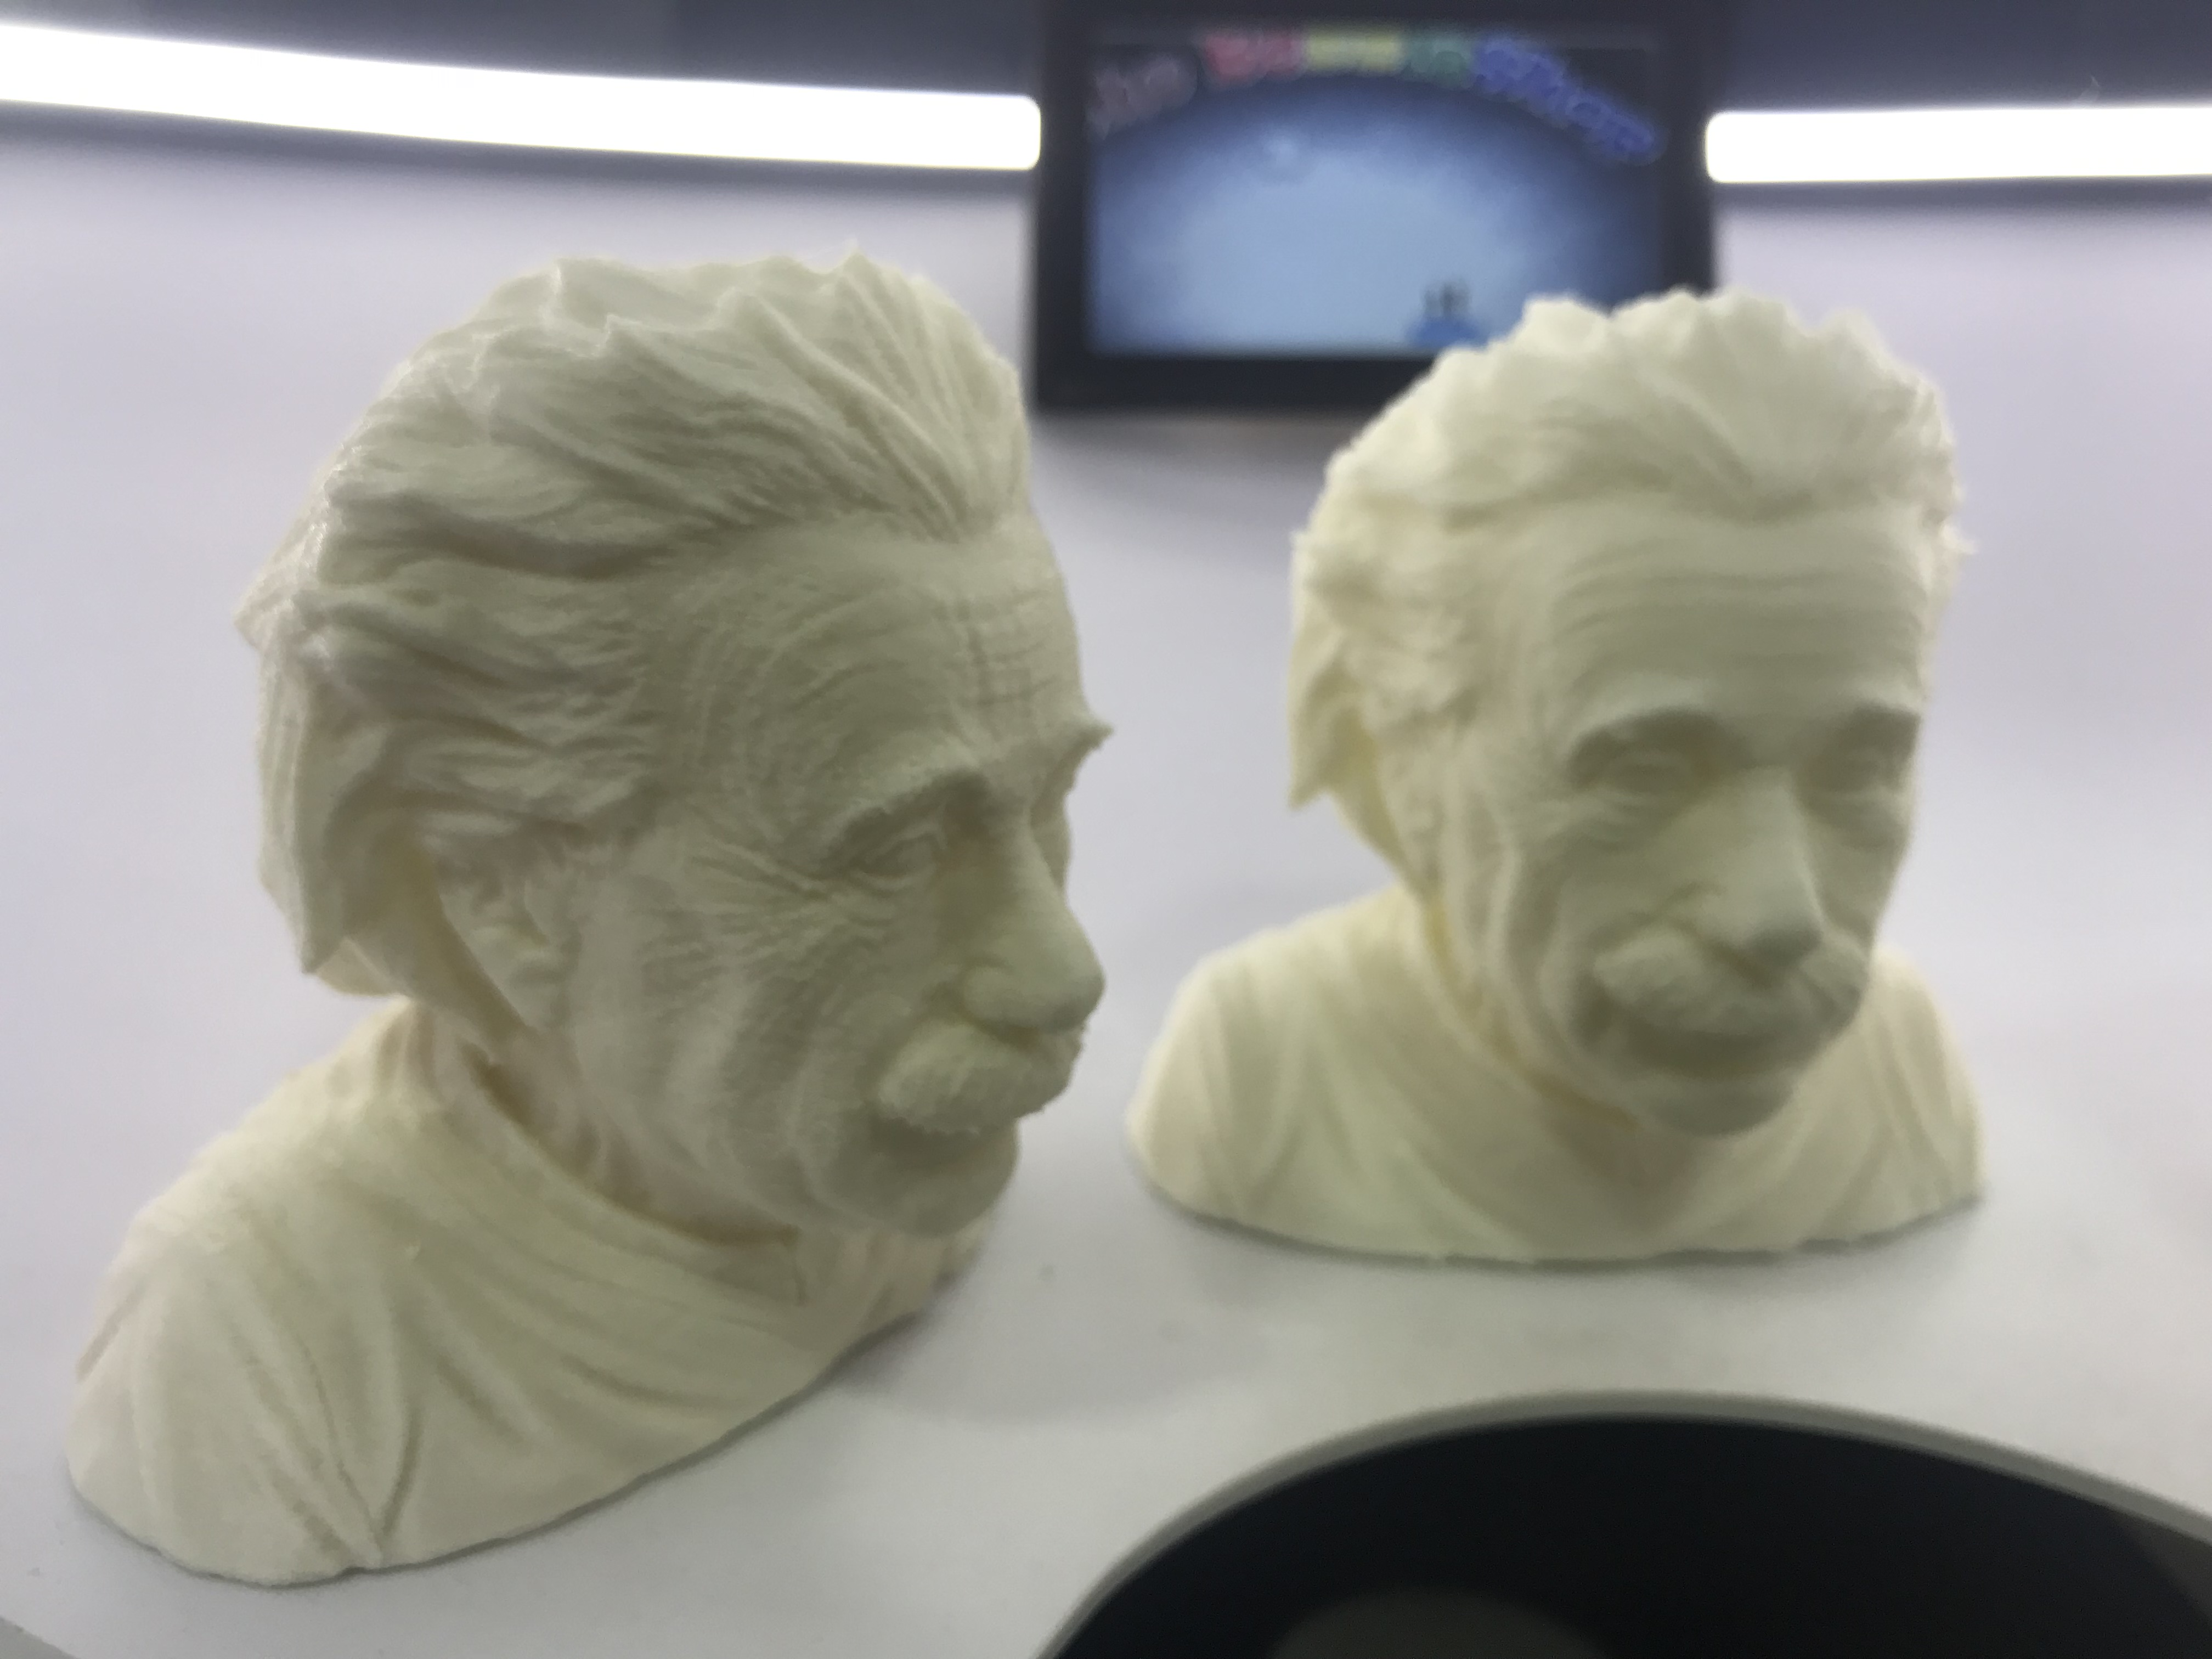 Animation 3D impression